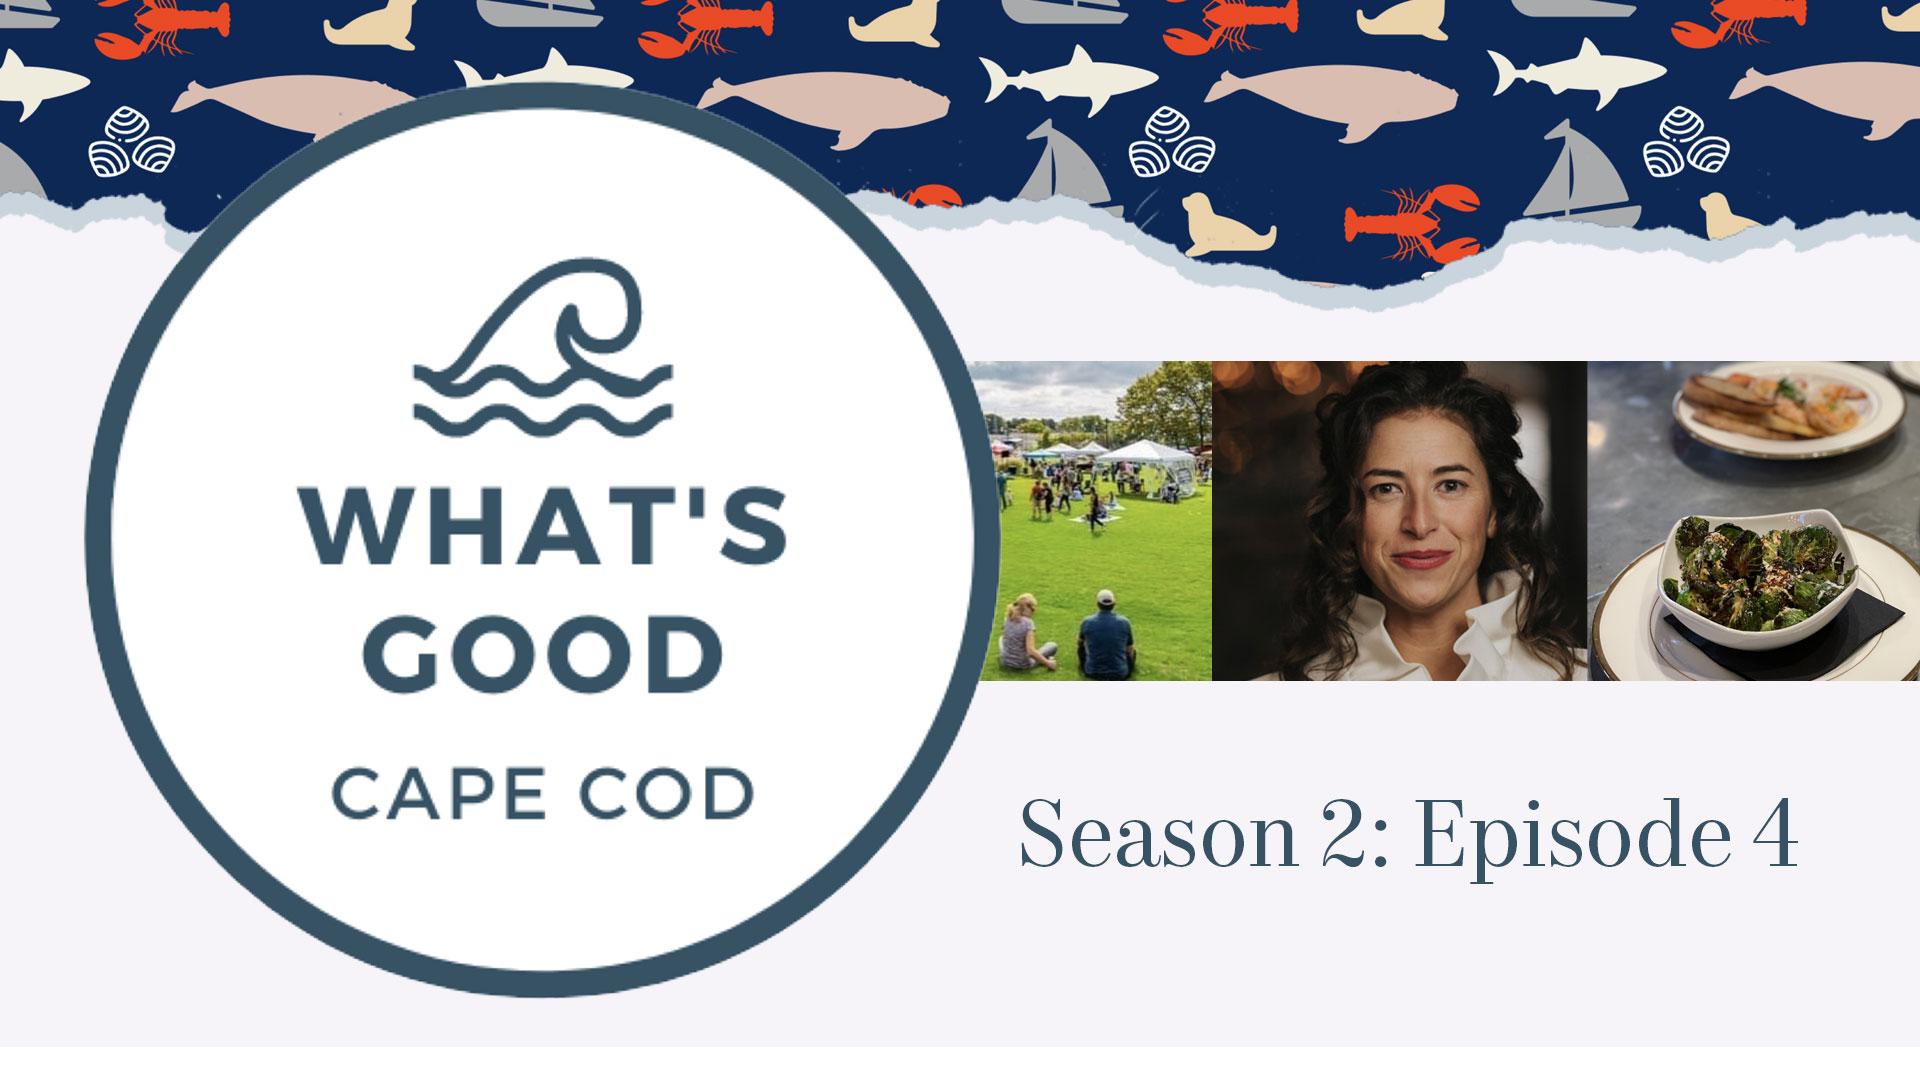 What's Good Cape Cod » Season 2 Episode 4